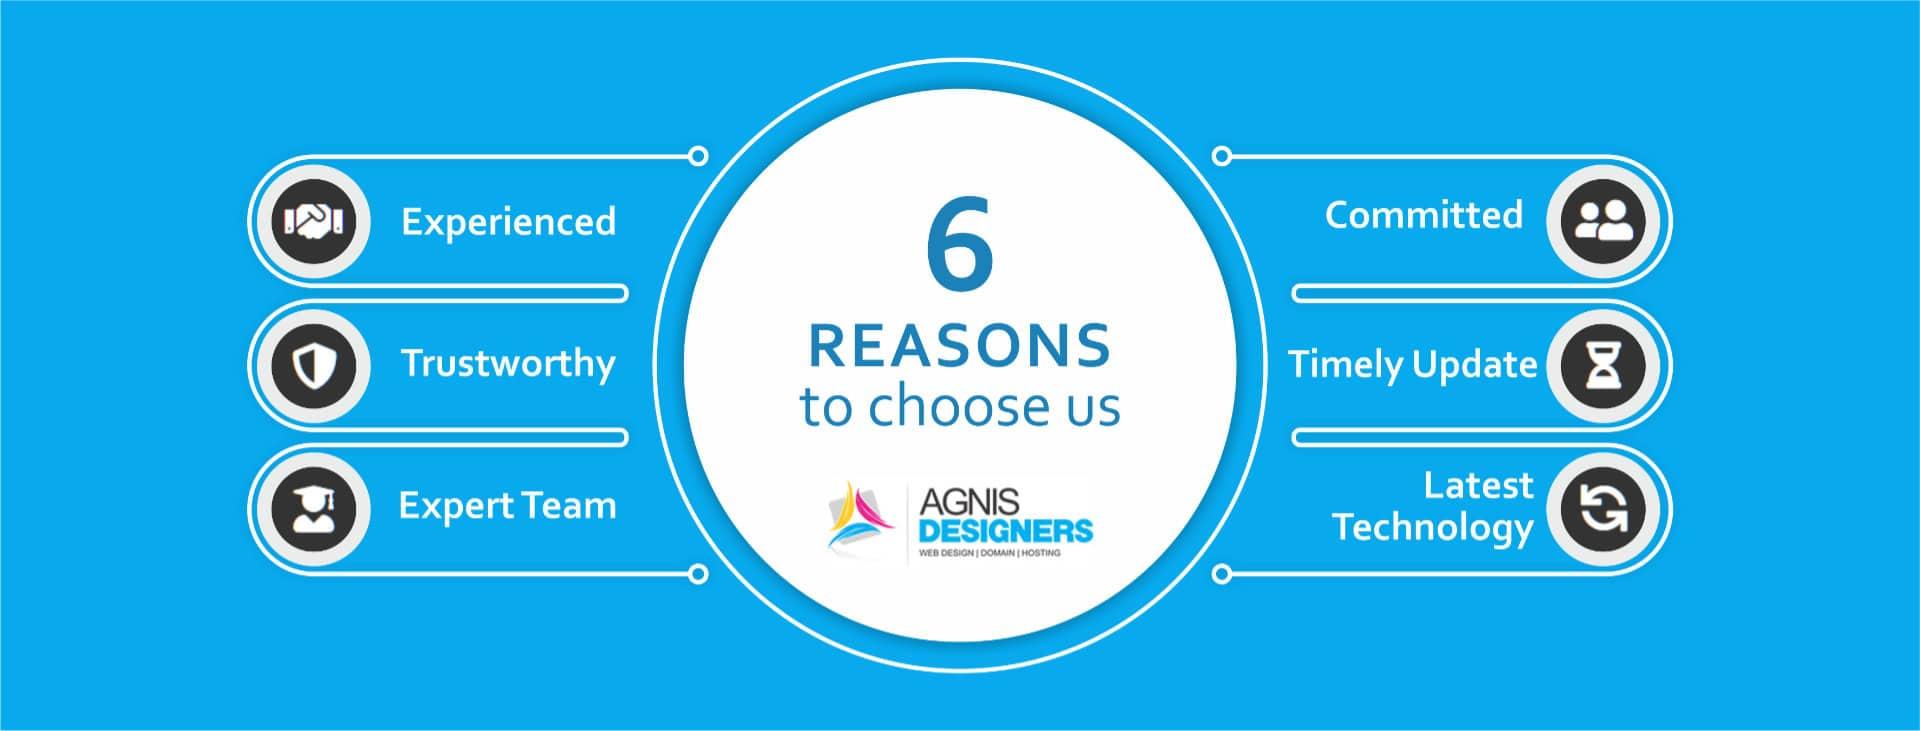 Trusted Web Design Digital Marketing Company In Kolhapur Agnis Designers